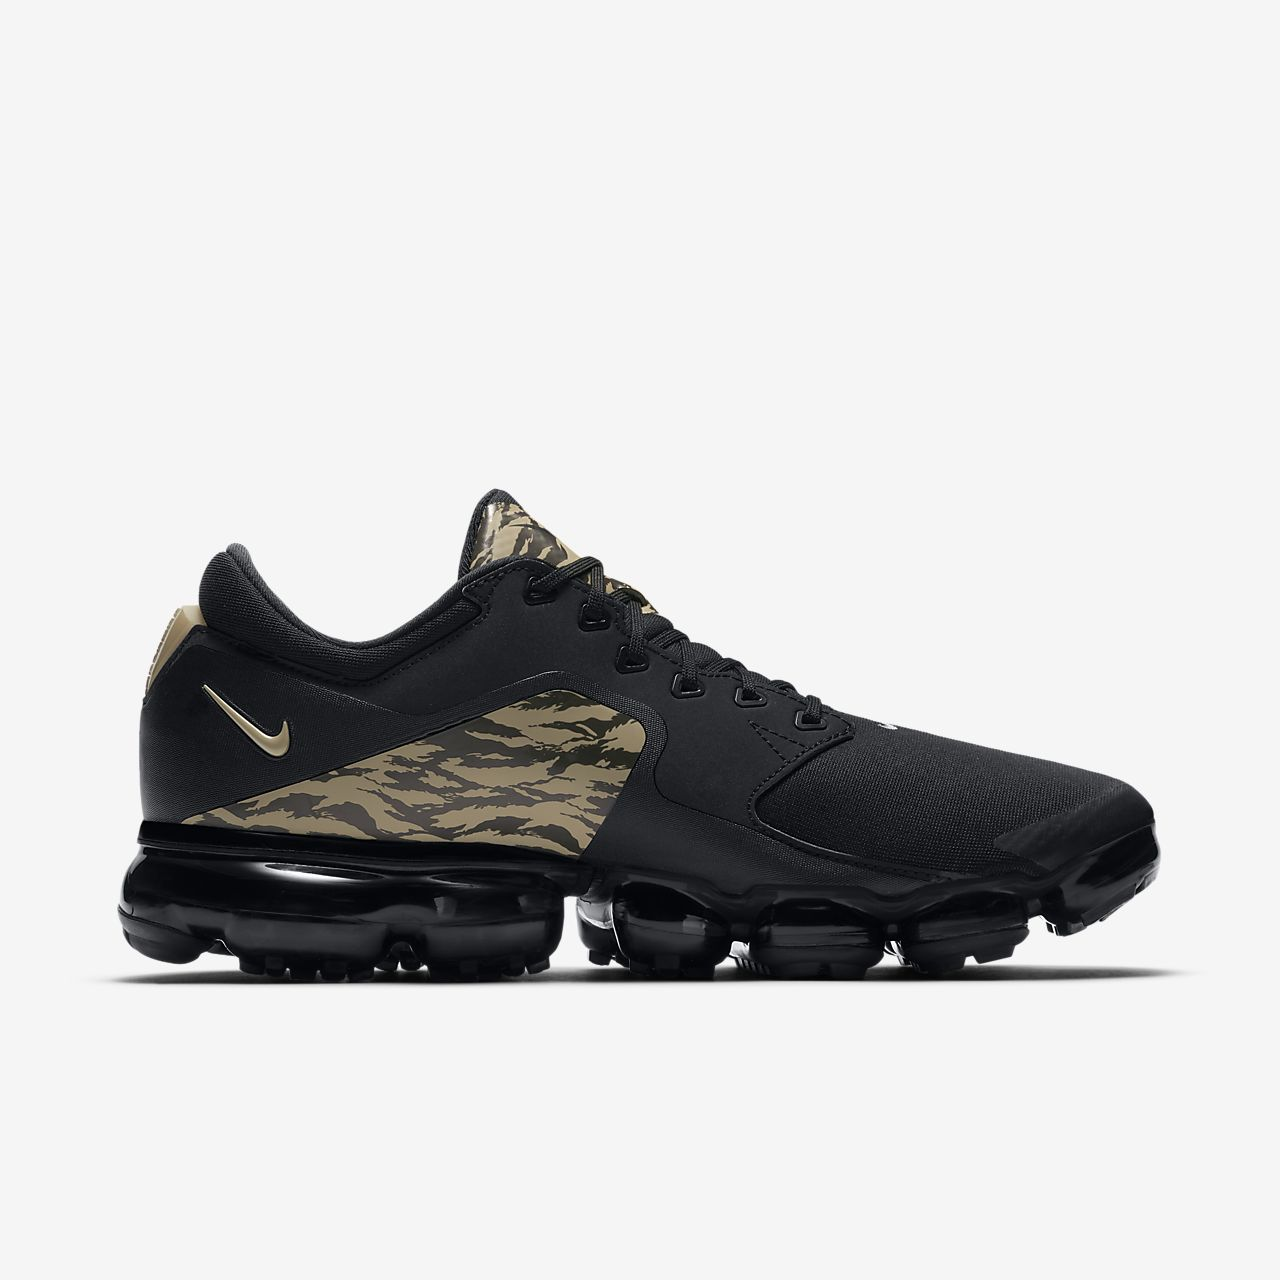 ... Chaussure de running Nike Air VaporMax pour Homme